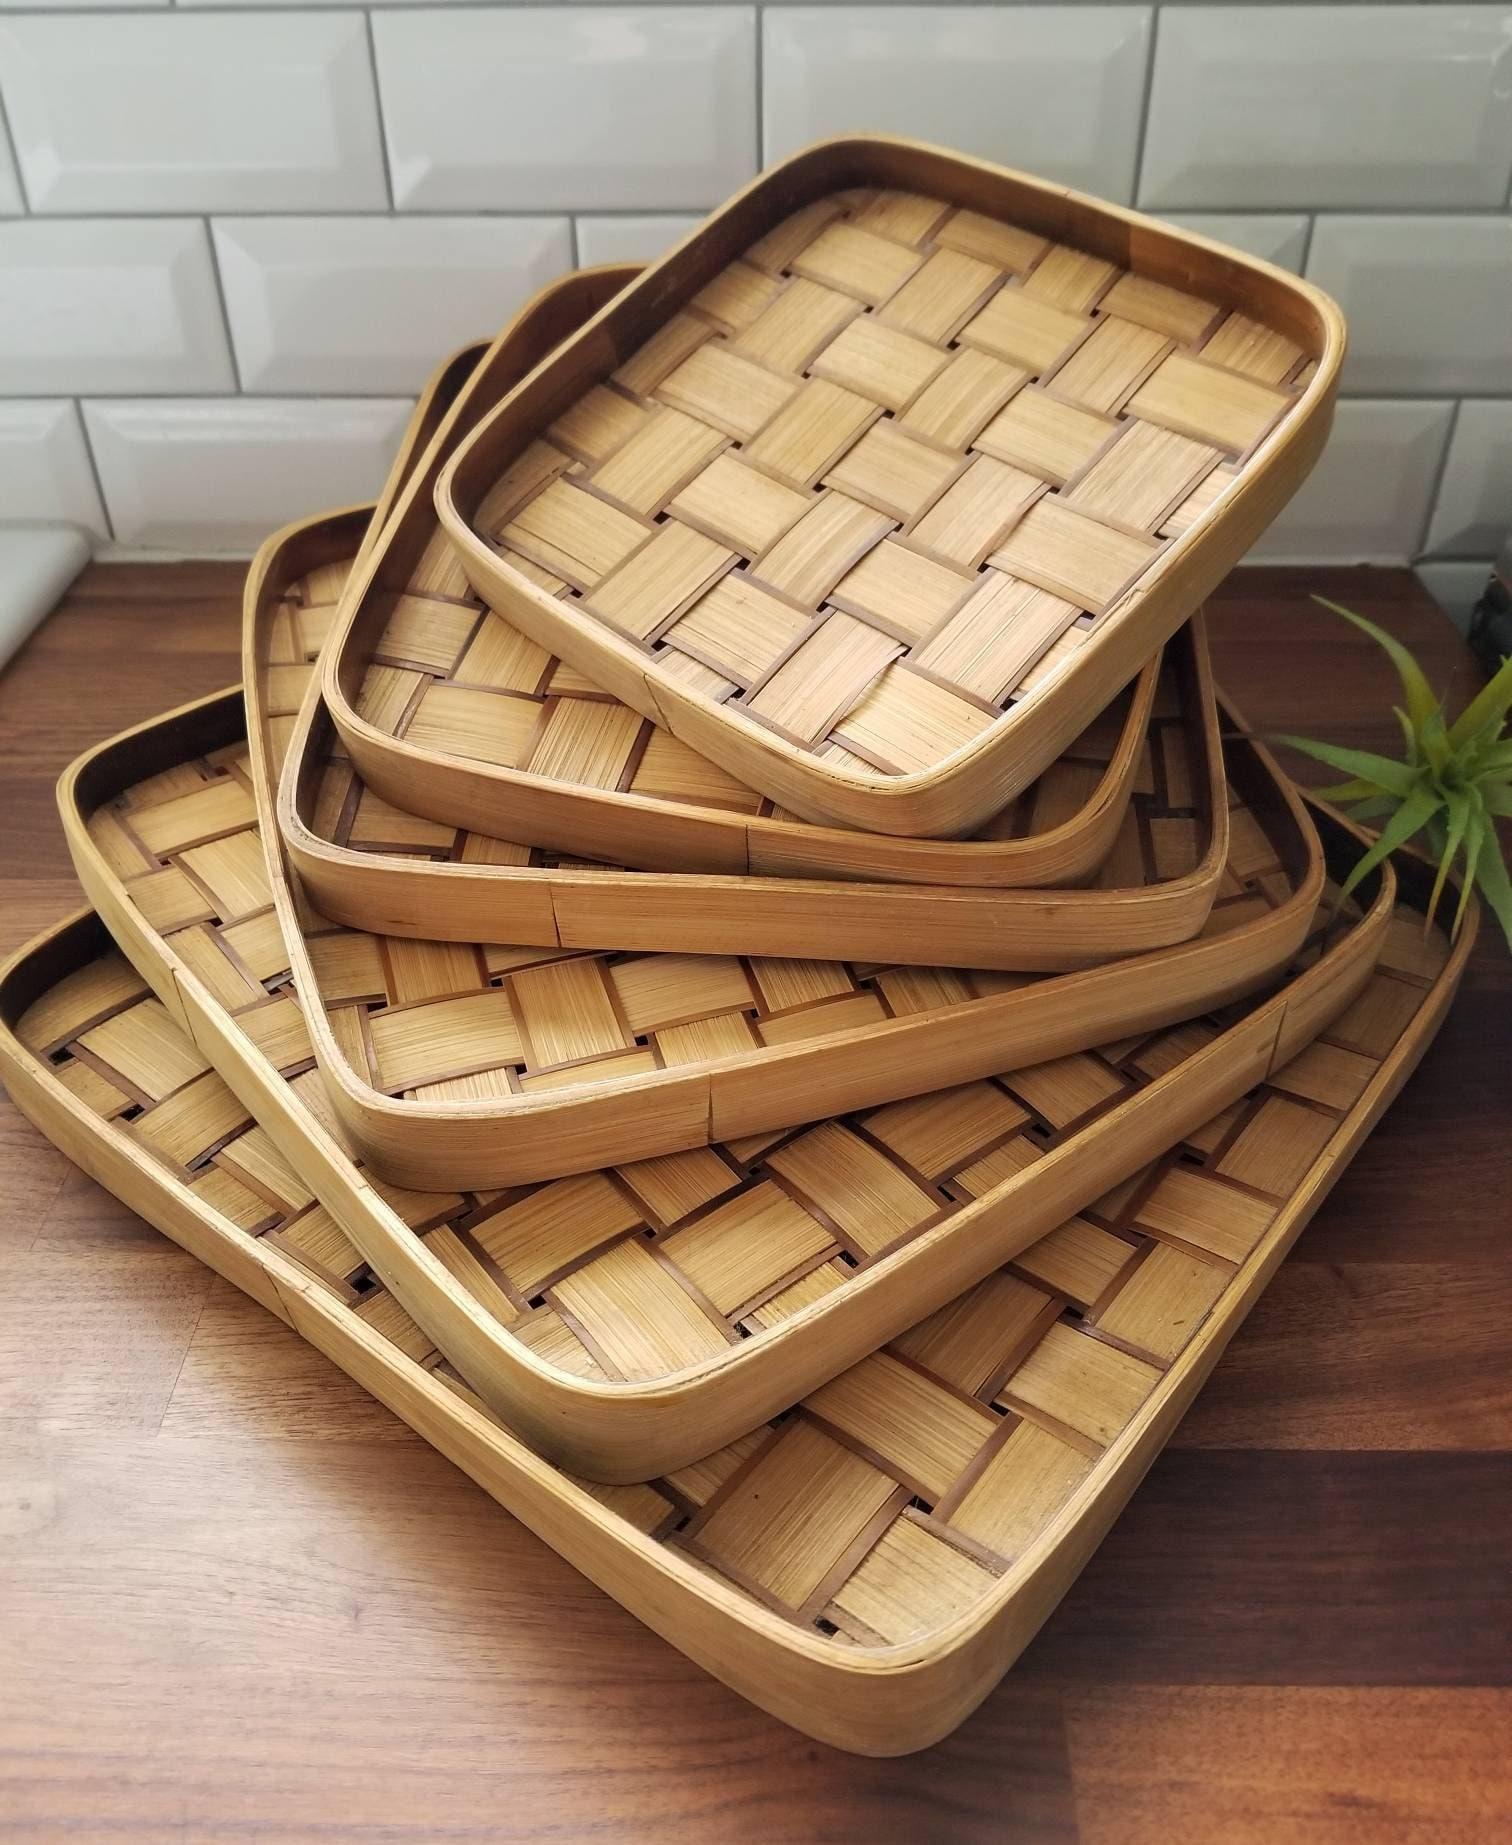 Vintage Bamboo Tray Set Basket Wall Set Rattan Serving Trays Bohemian Entertaining Outdoor Entertaining Platters Tray Decor